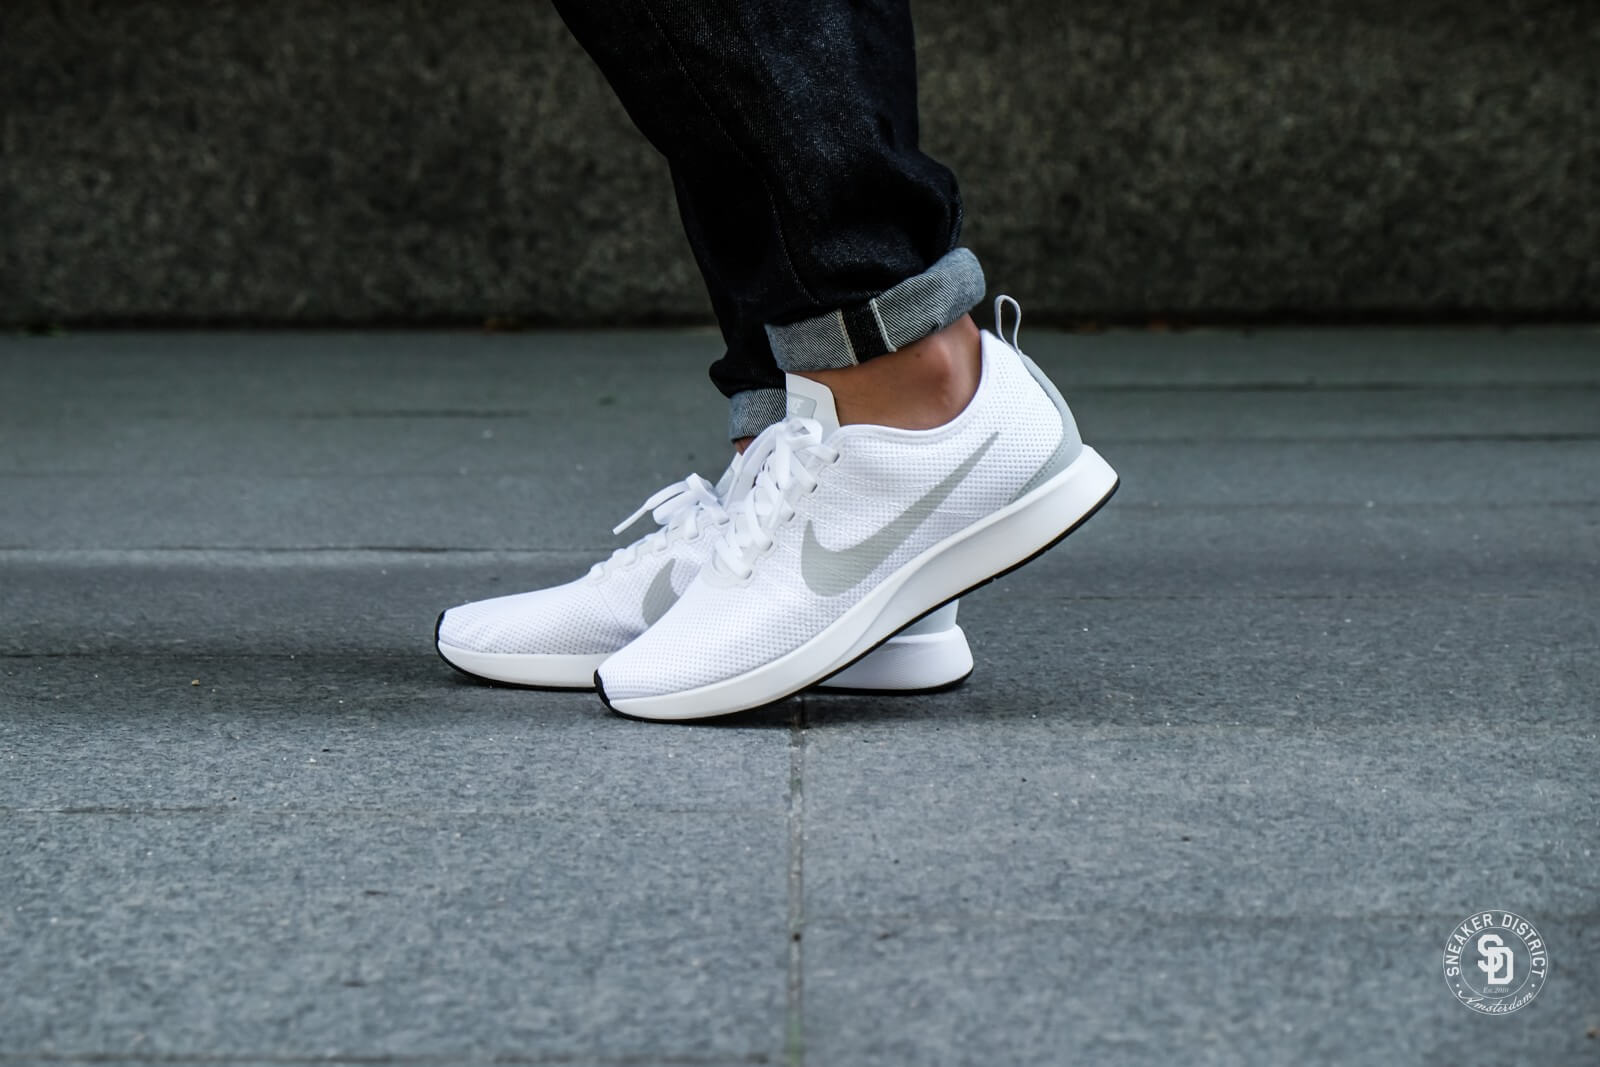 Nike Dualtone Racer White 918227 Pure Platinum White Noir 918227 White 102 7fc316